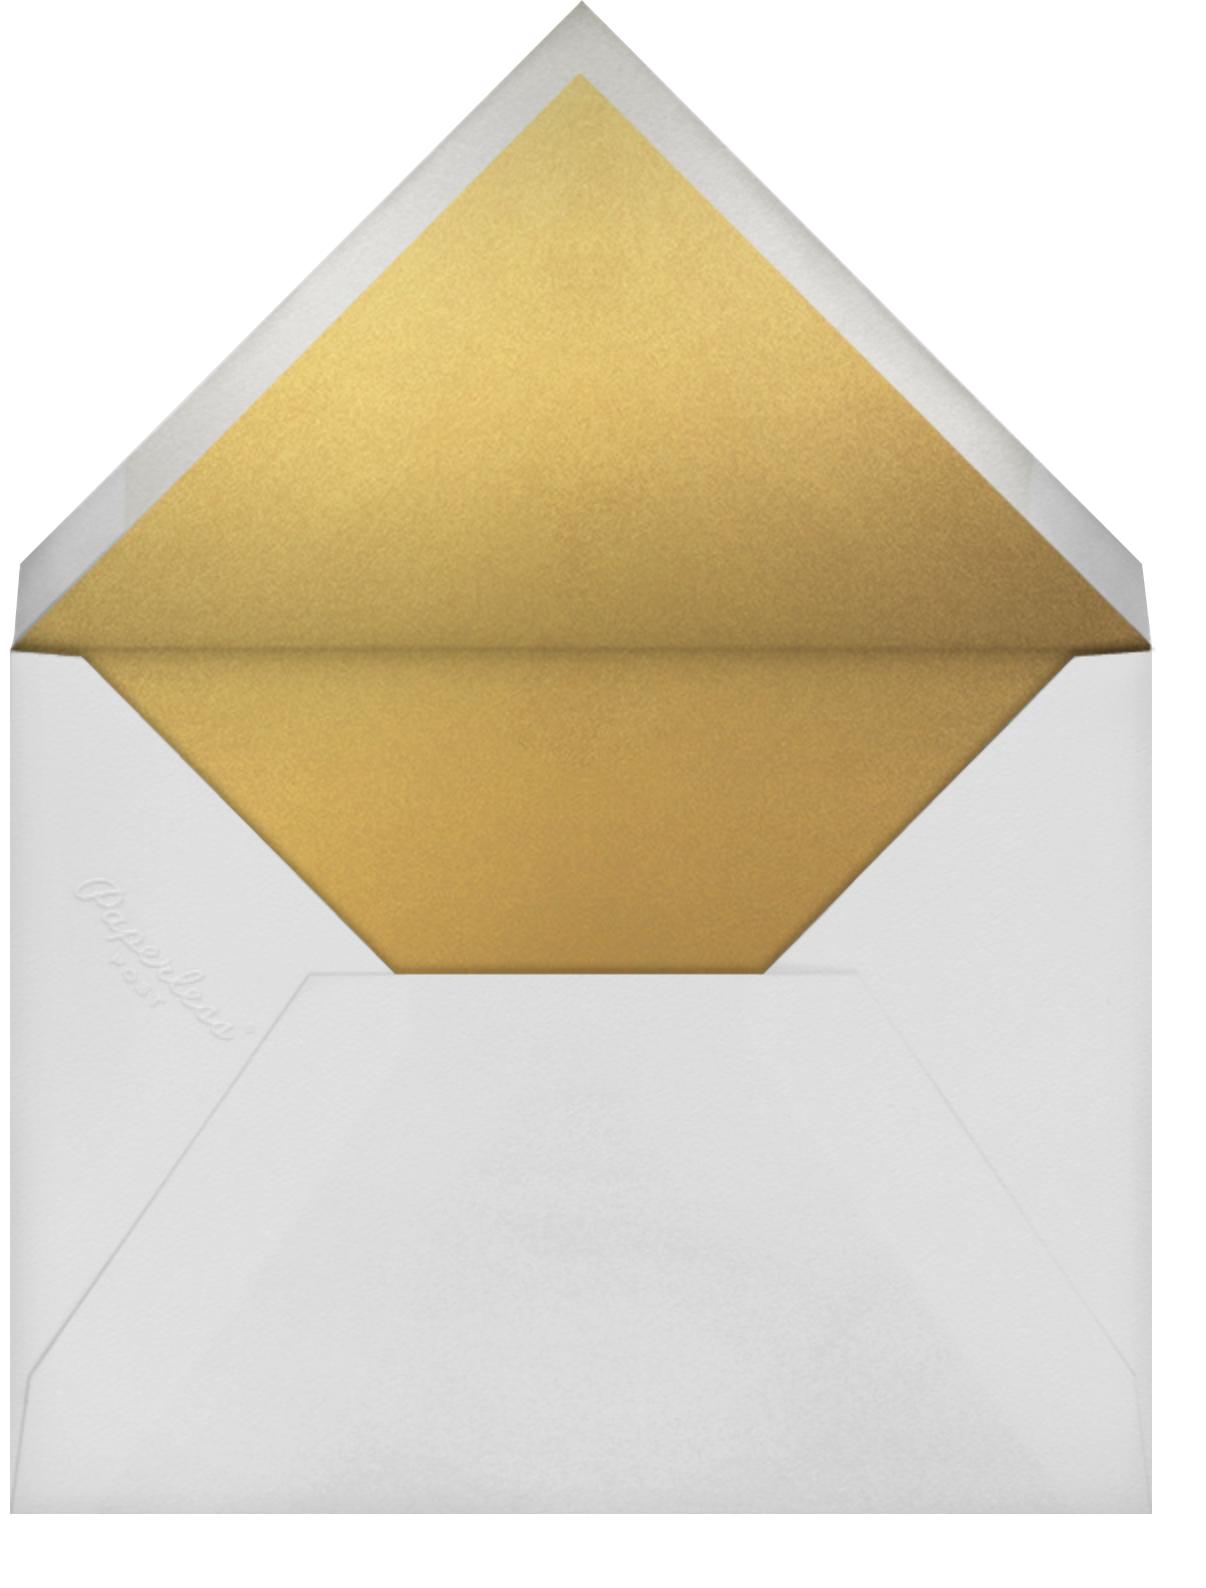 Big Year - Paperless Post - Adult birthday - envelope back